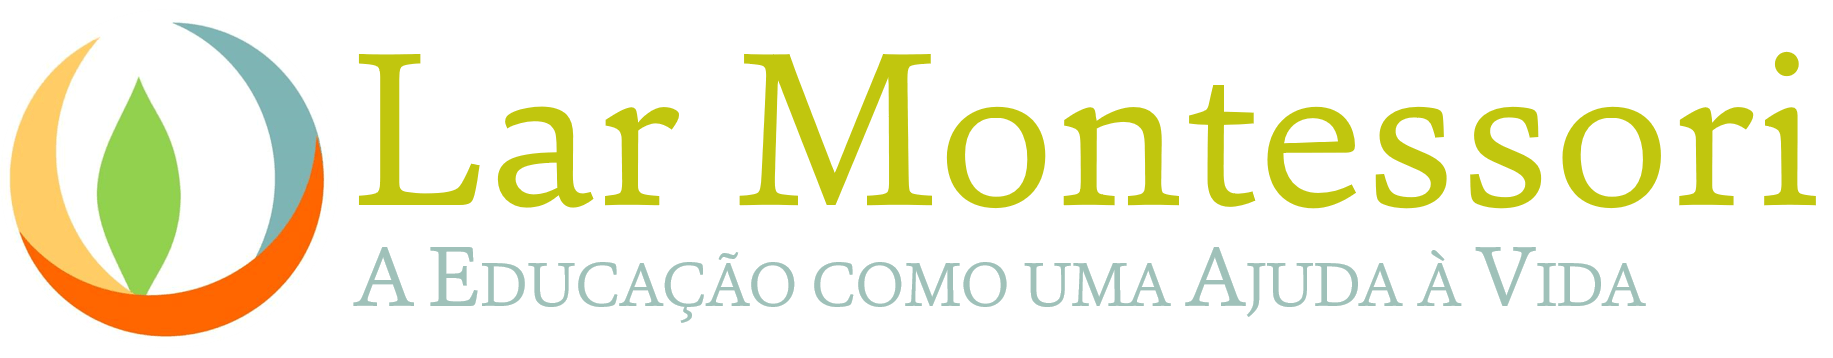 Lar Montessori